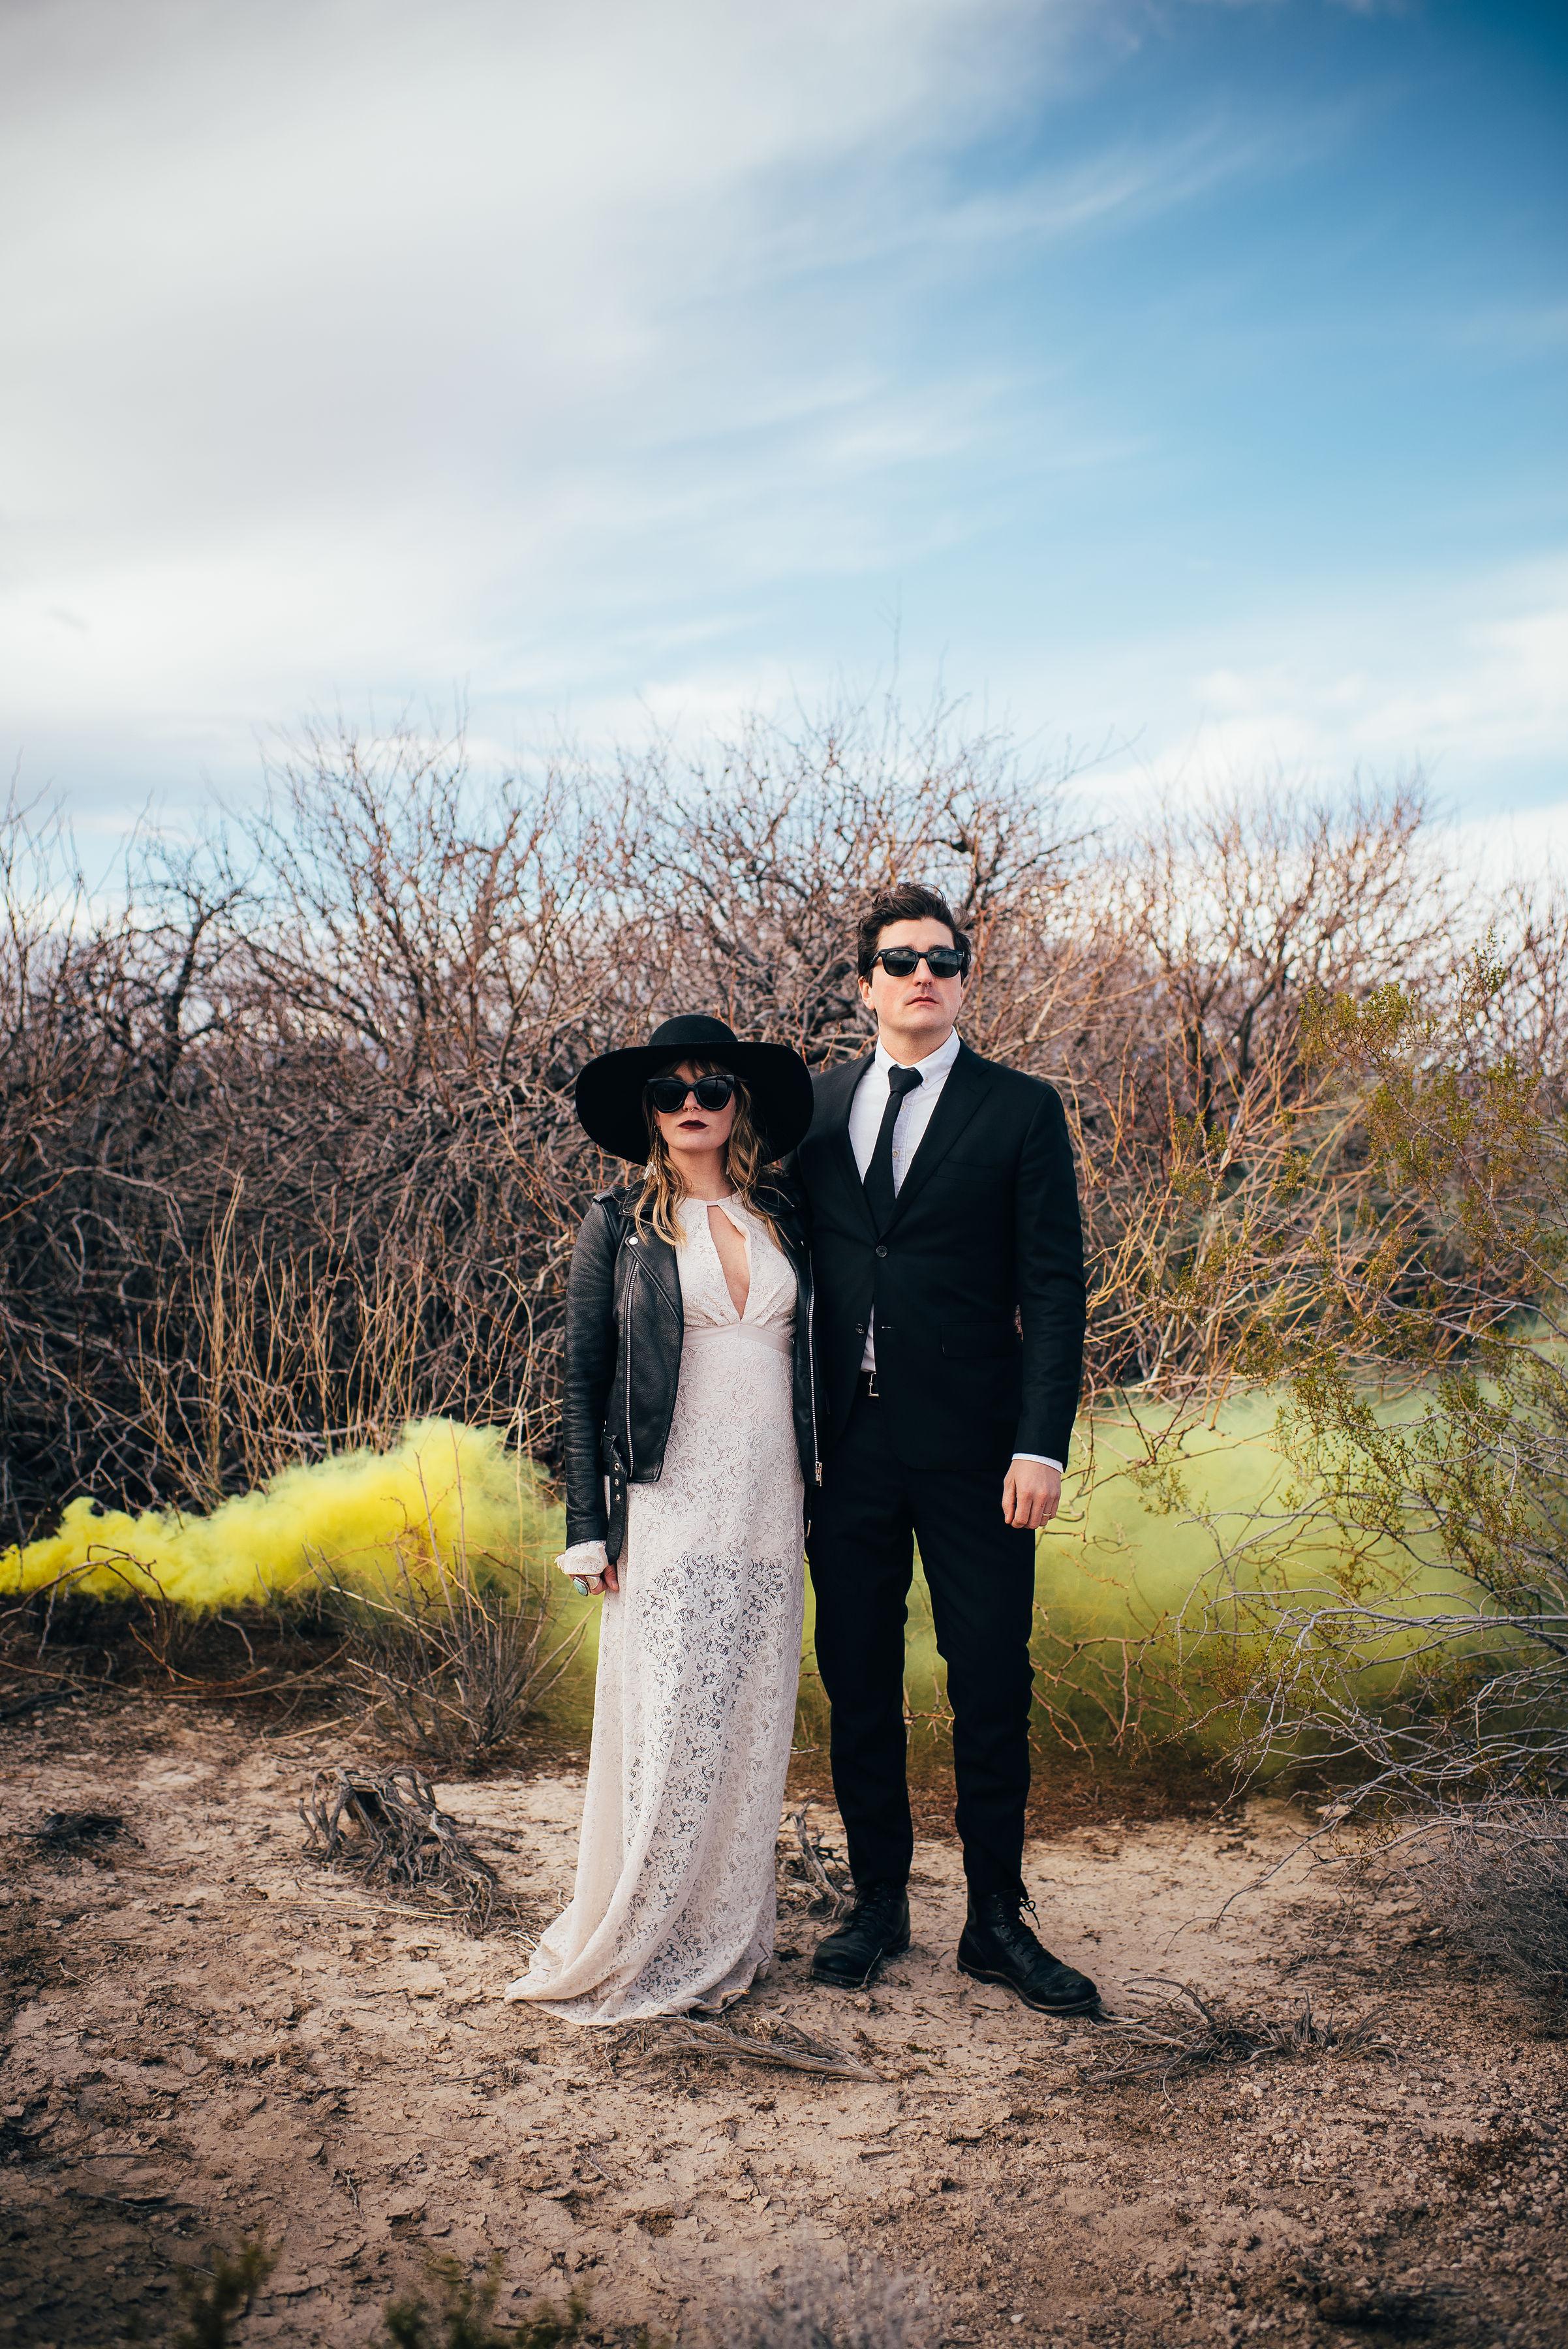 north carolina wedding photographer - california wedding photographer - death valley wedding photographer - destination wedding photographer - three region photography - motorcycle wedding